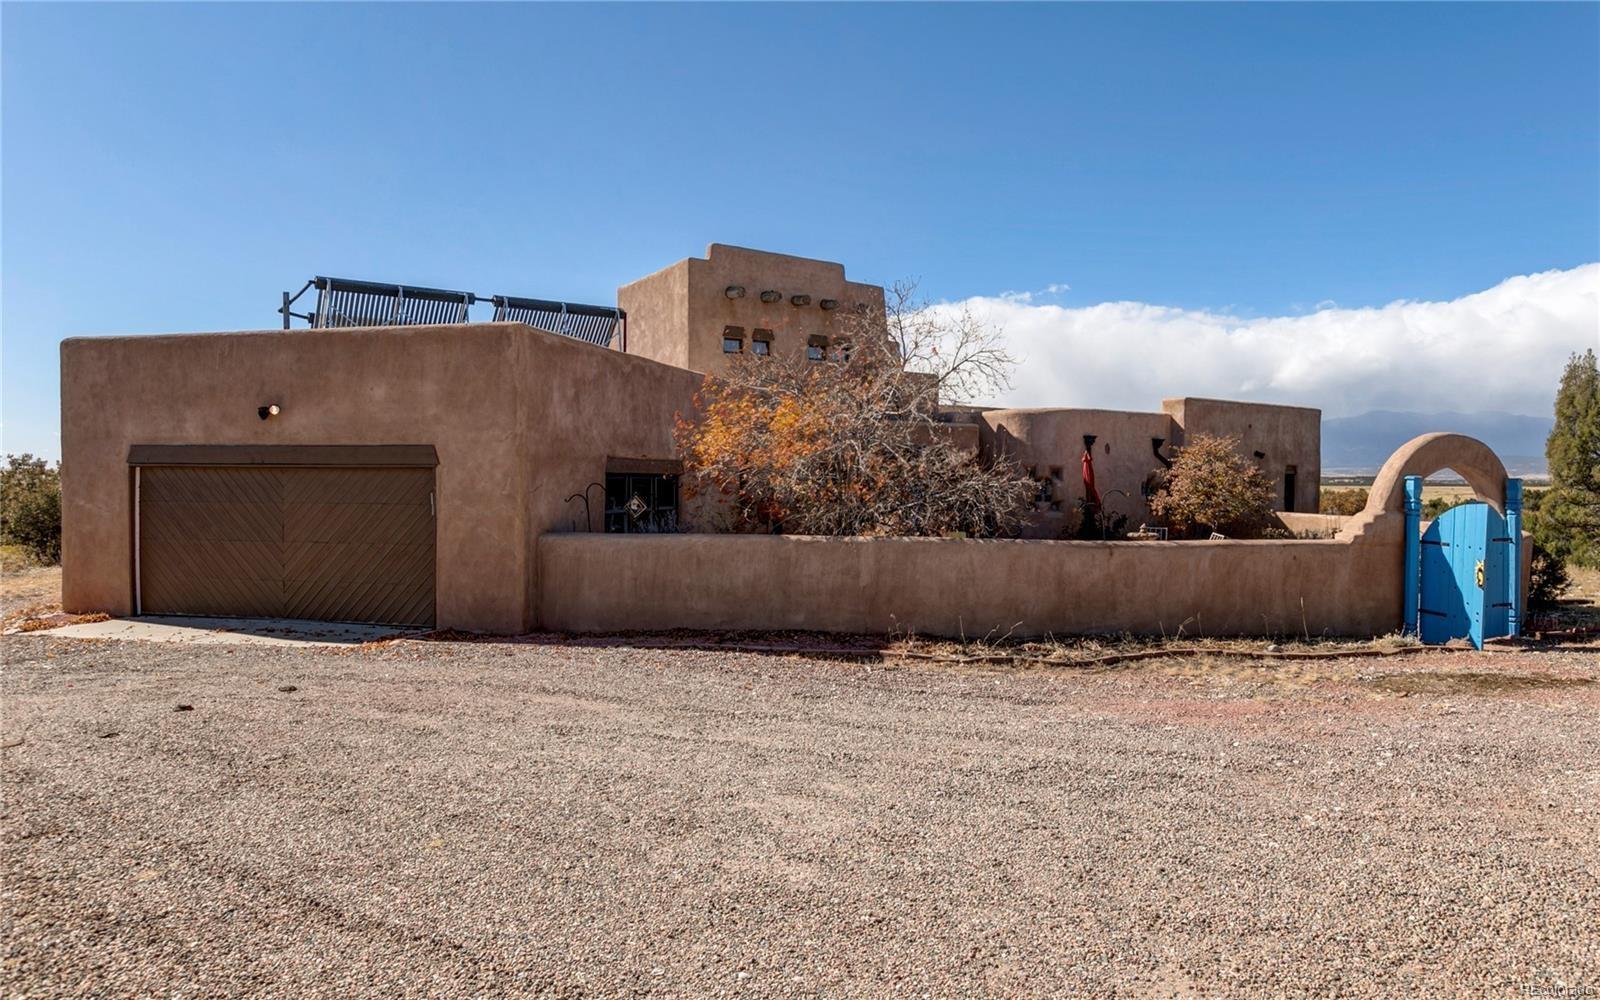 MLS# 3090448 - 4 - 7708 Sunset Ridge Drive, Pueblo, CO 81004